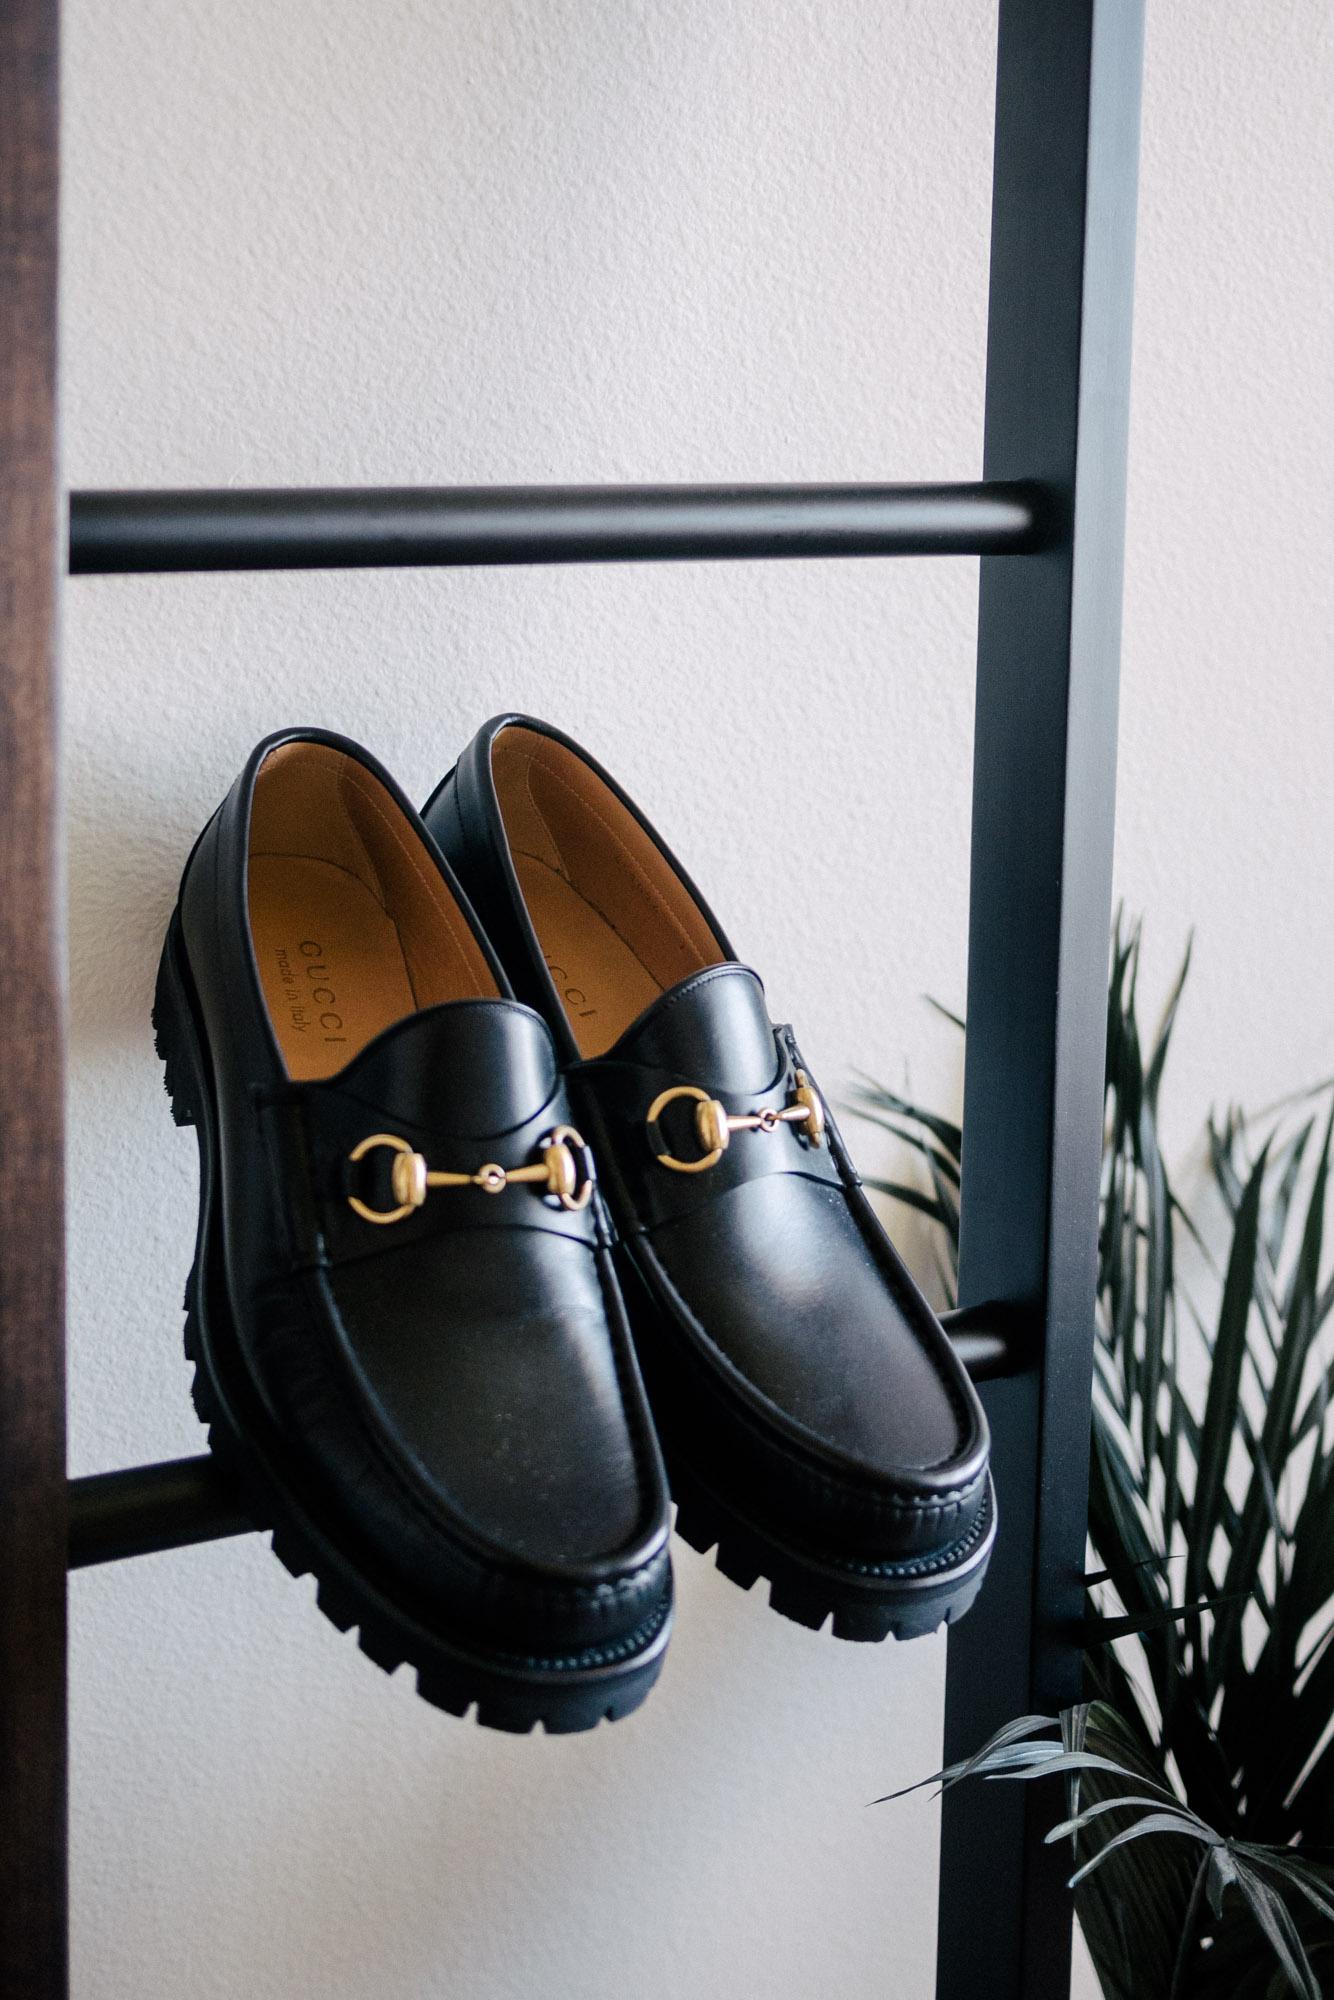 mybelonging-gucci-horsebit-black-loafers-menswear-mens-shoes-luxury-designer-1.jpg